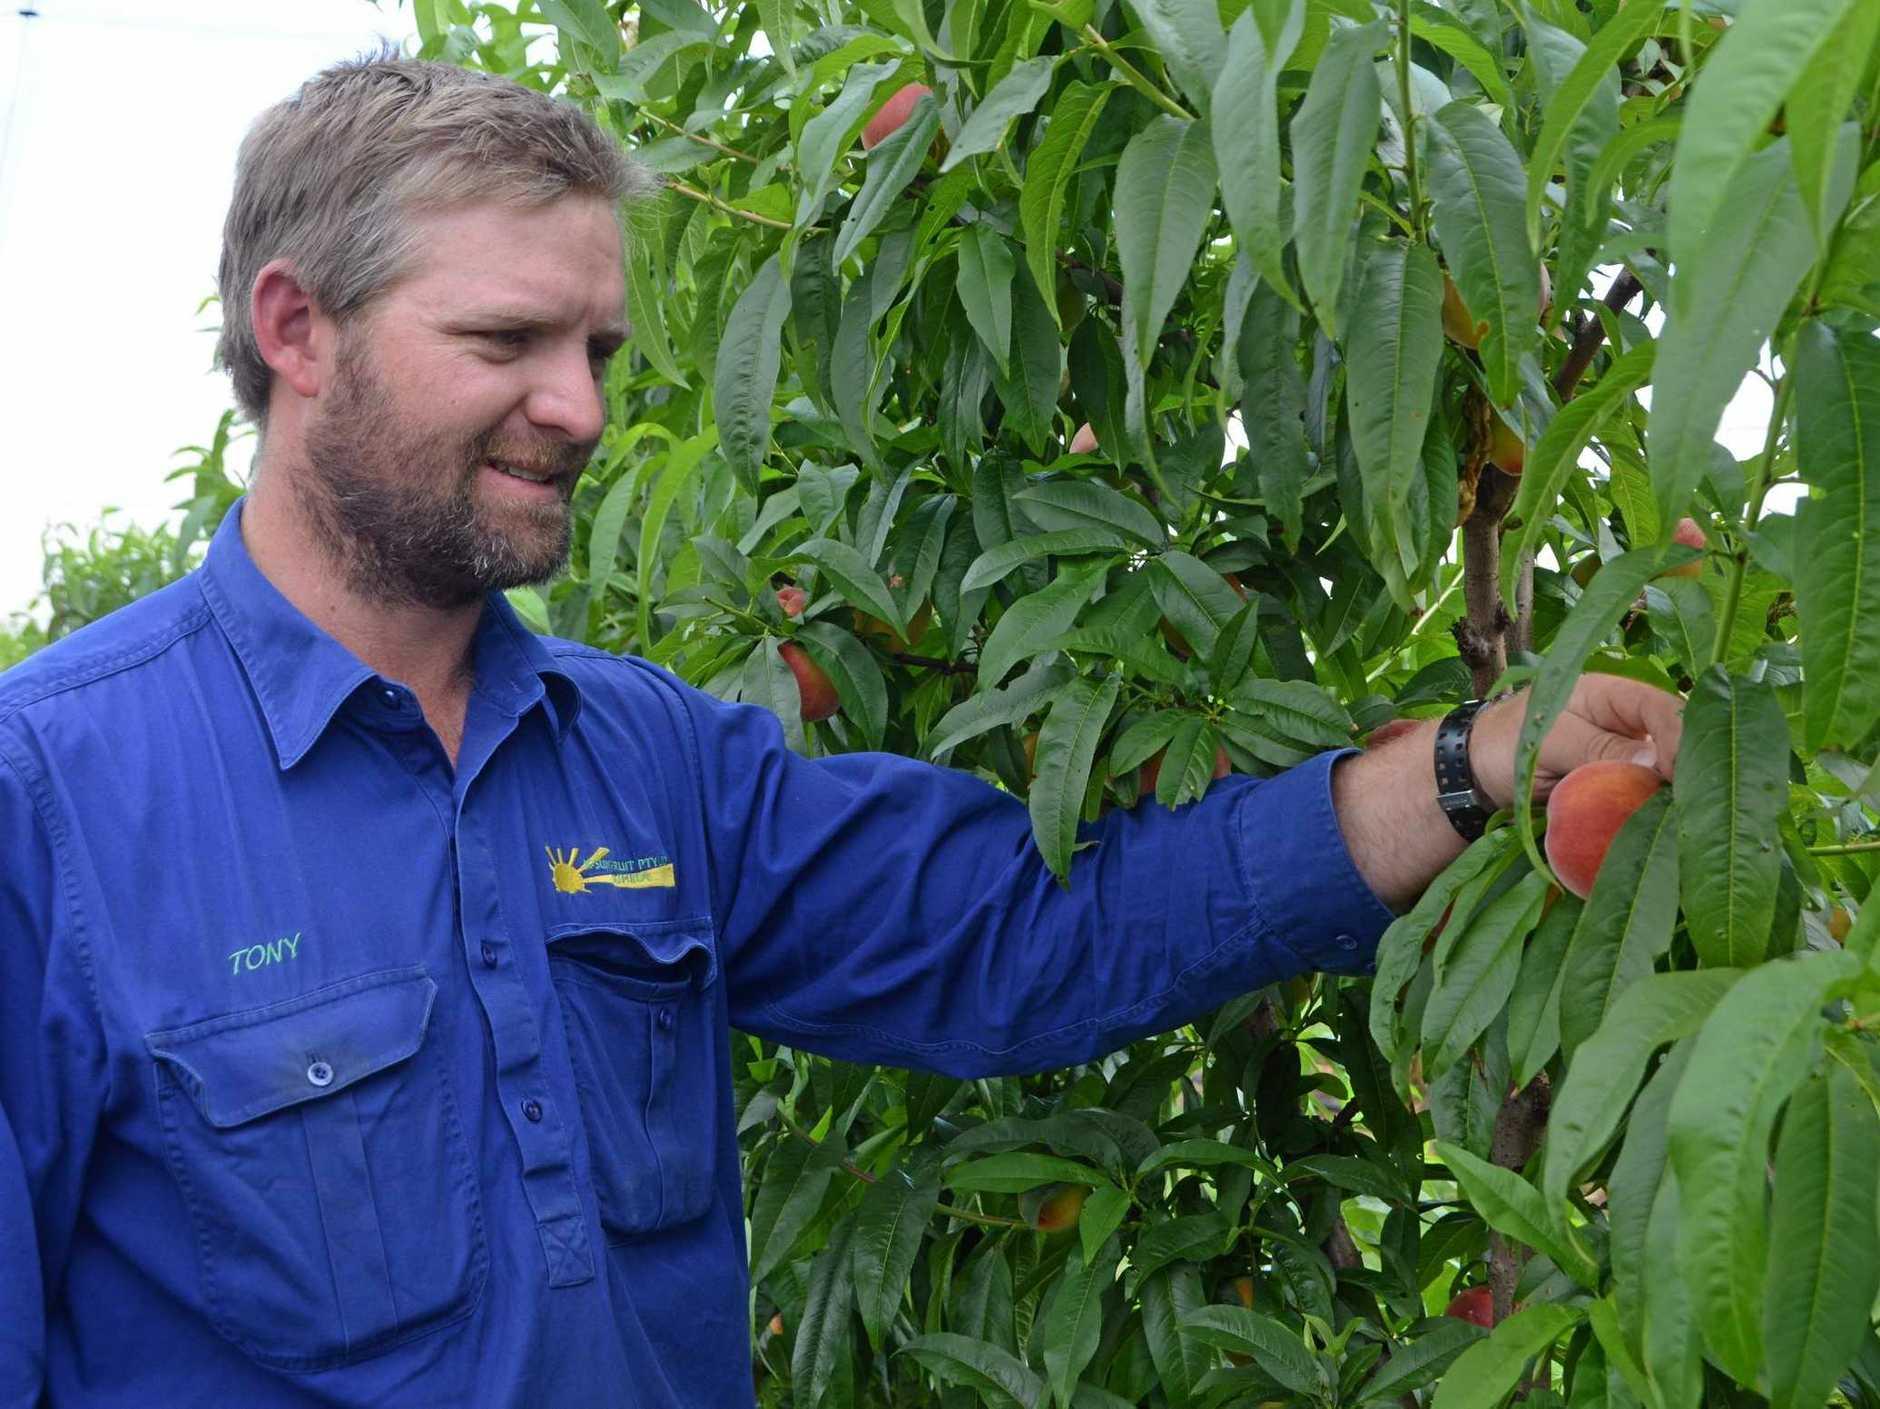 STONE FRUIT SEASON: Tony Dugdell is proud of the fruit produced this season.